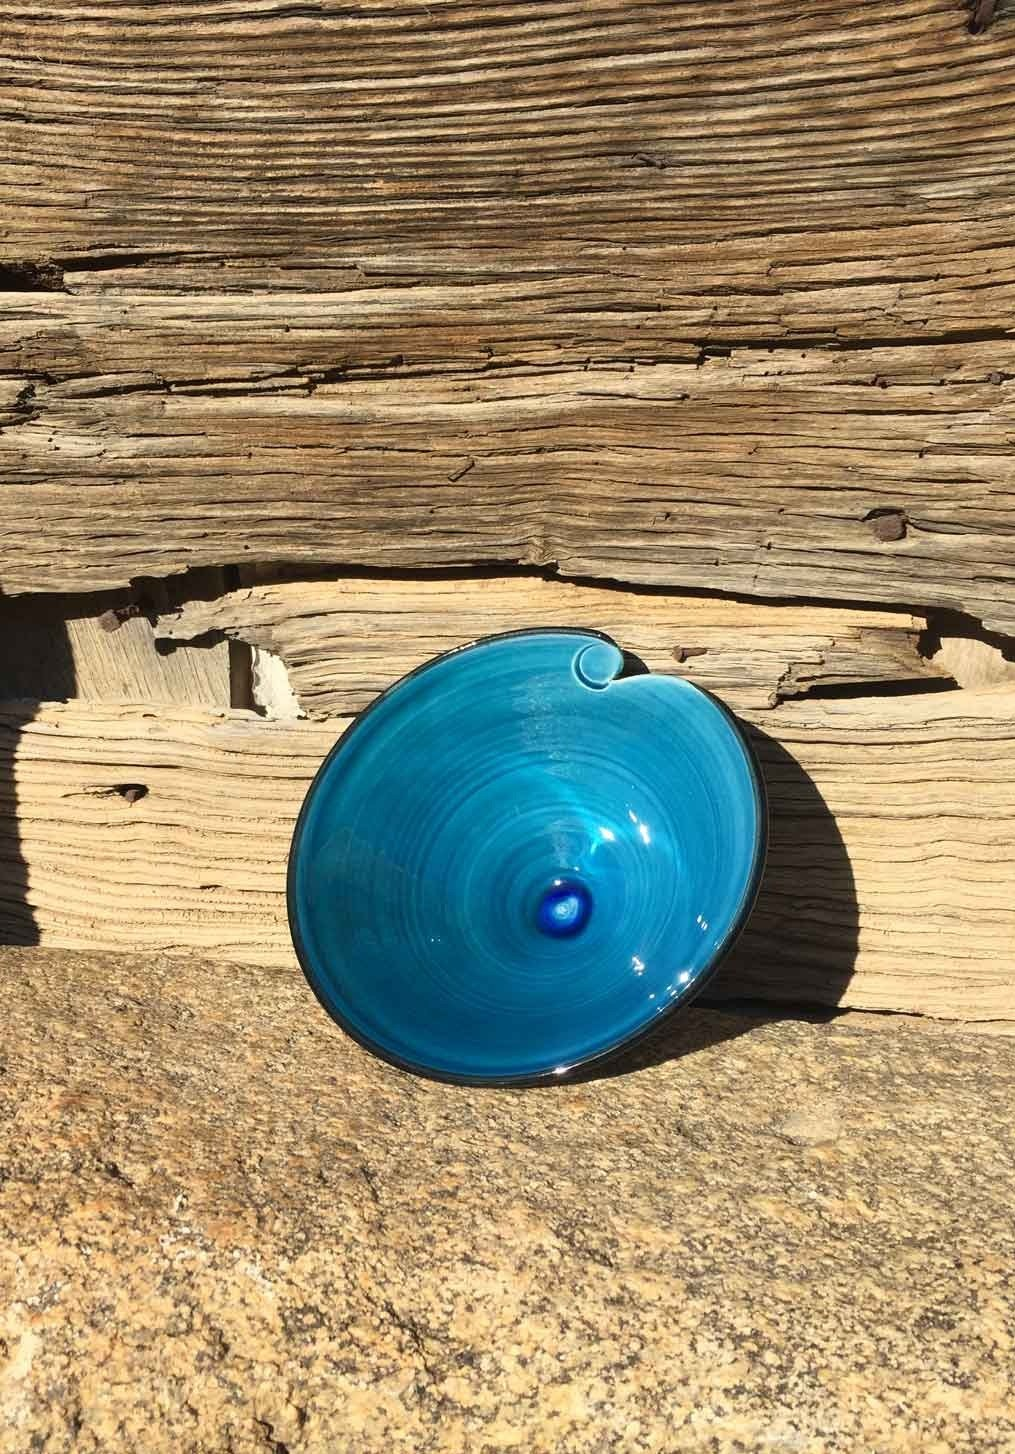 021coupelle-bleue-decoupe